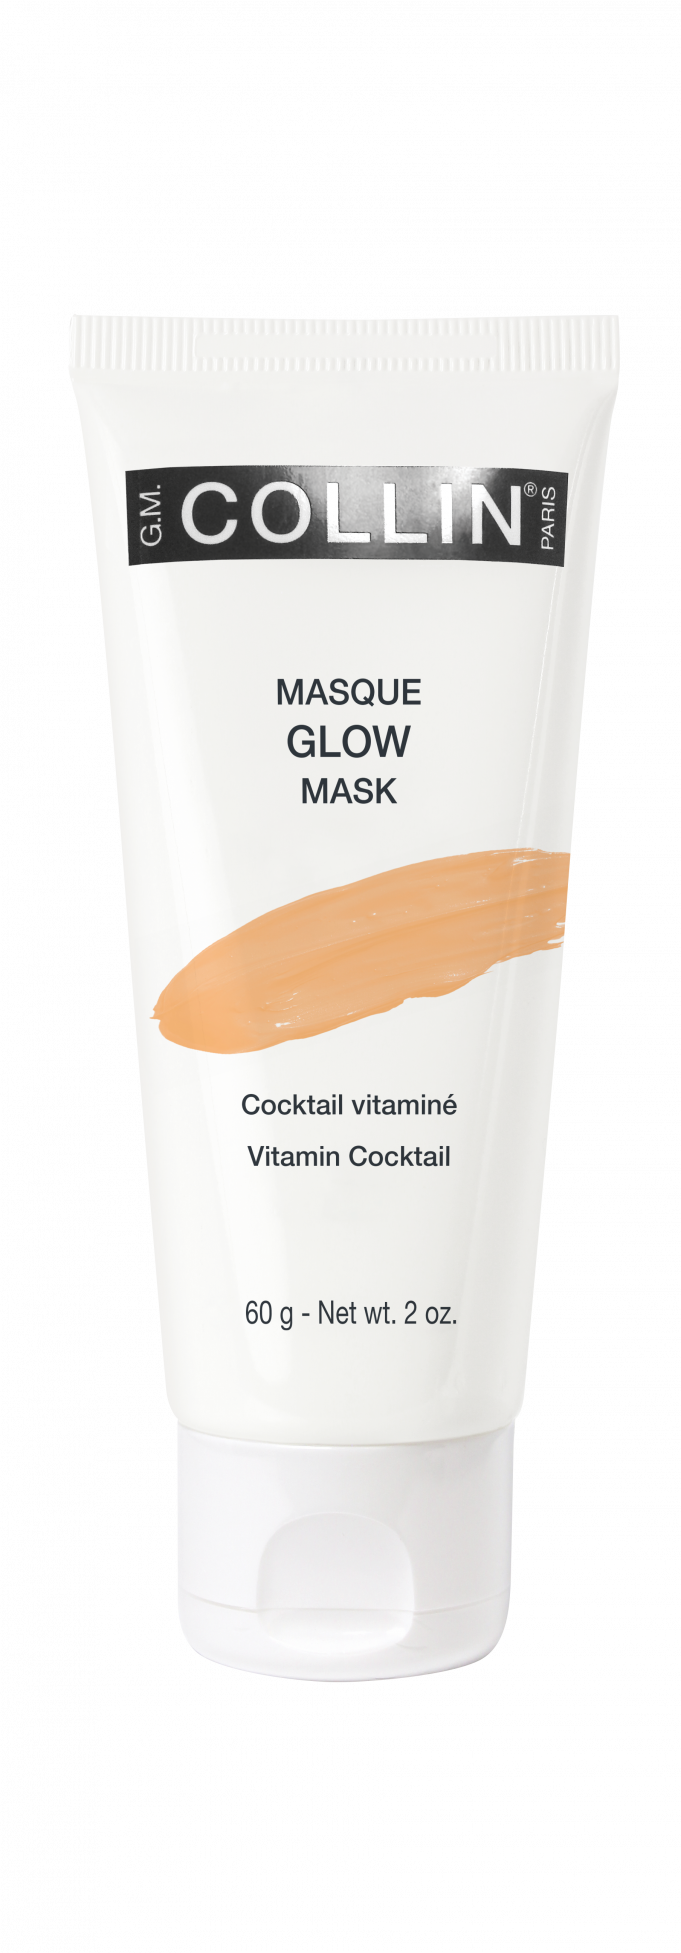 Masque Glow